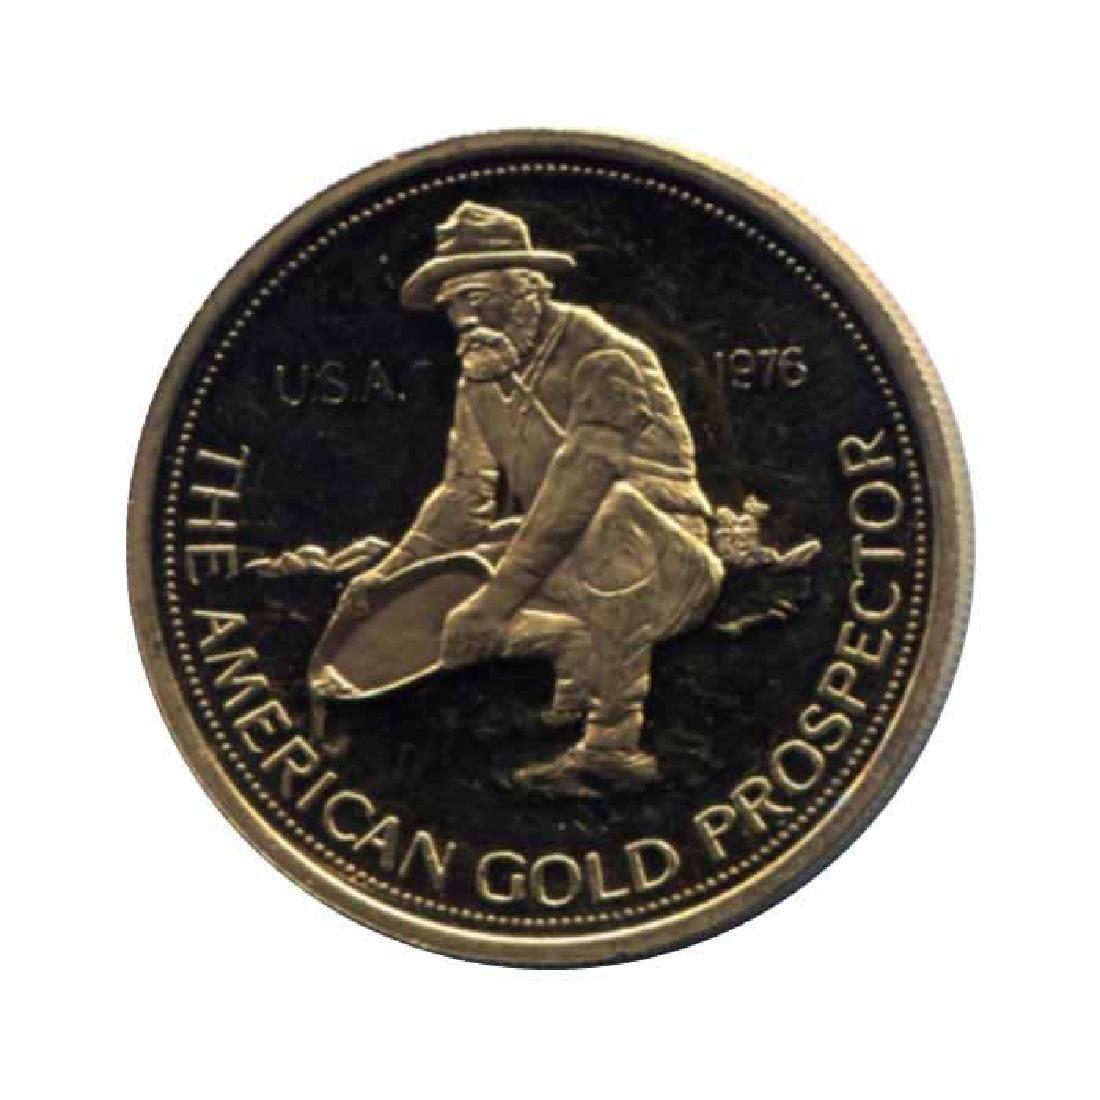 Engelhard 1 ounce gold round Prospector